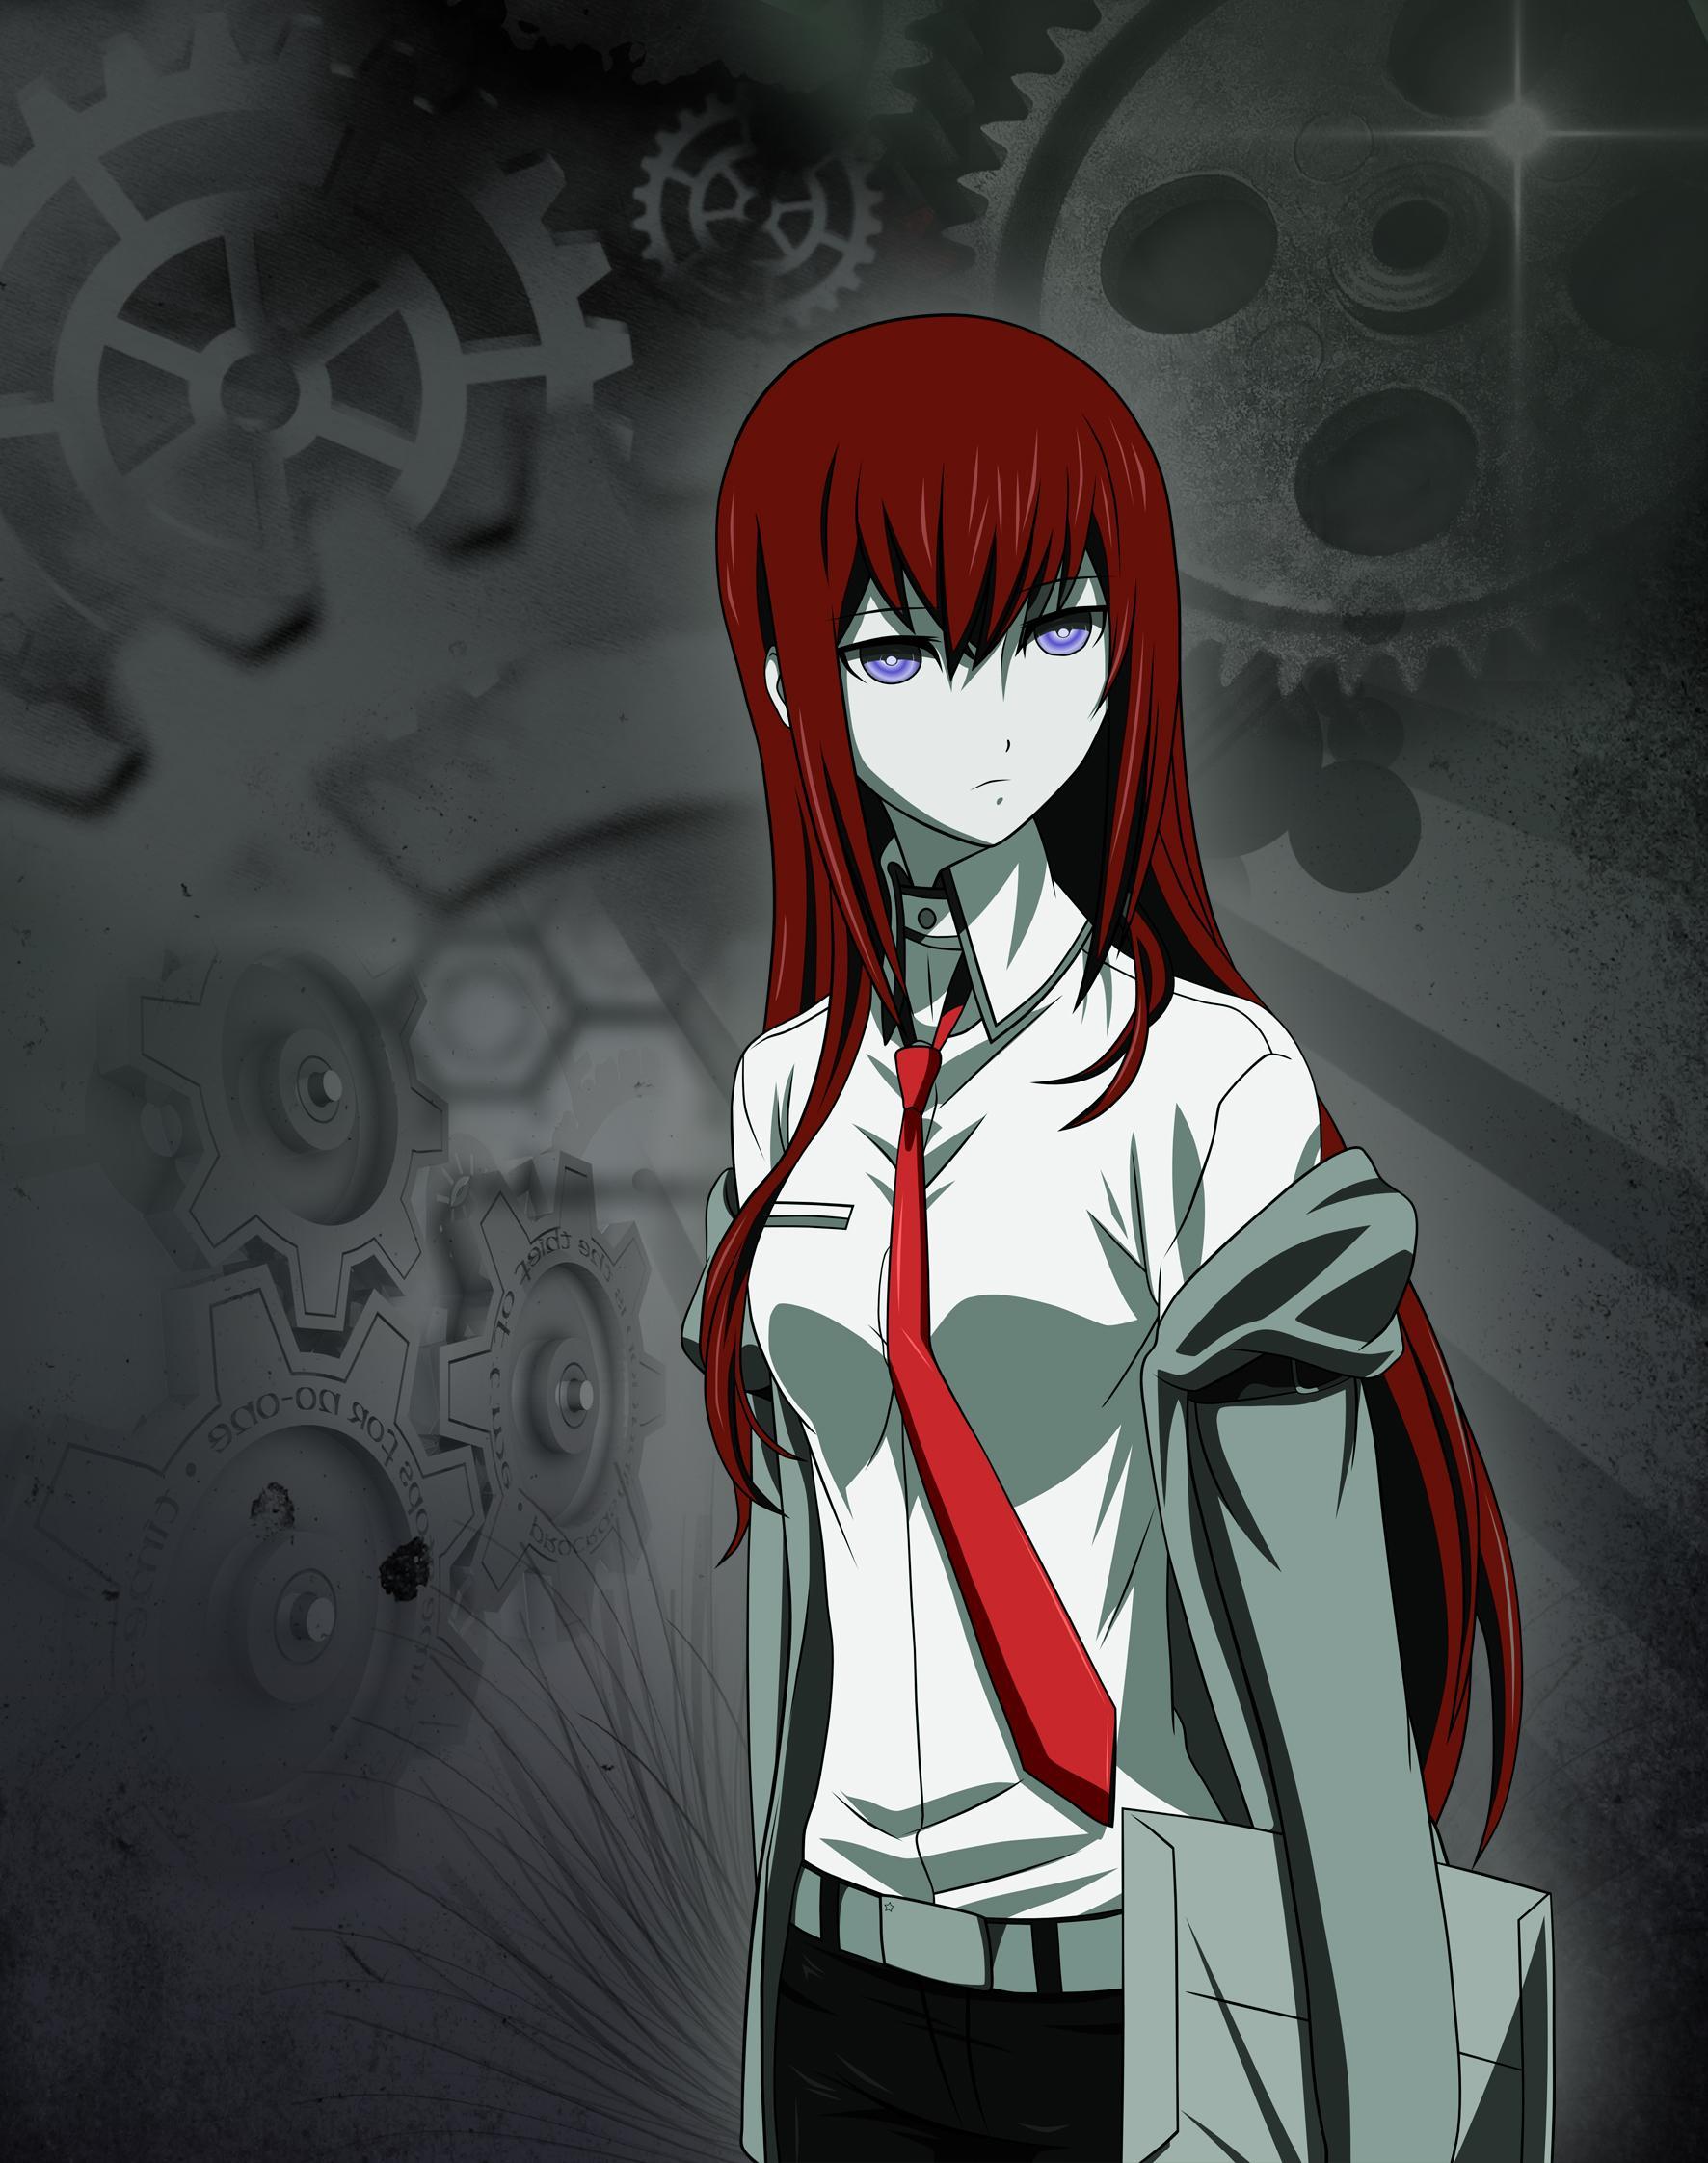 Makise Kurisu Wallpapers Top Free Makise Kurisu